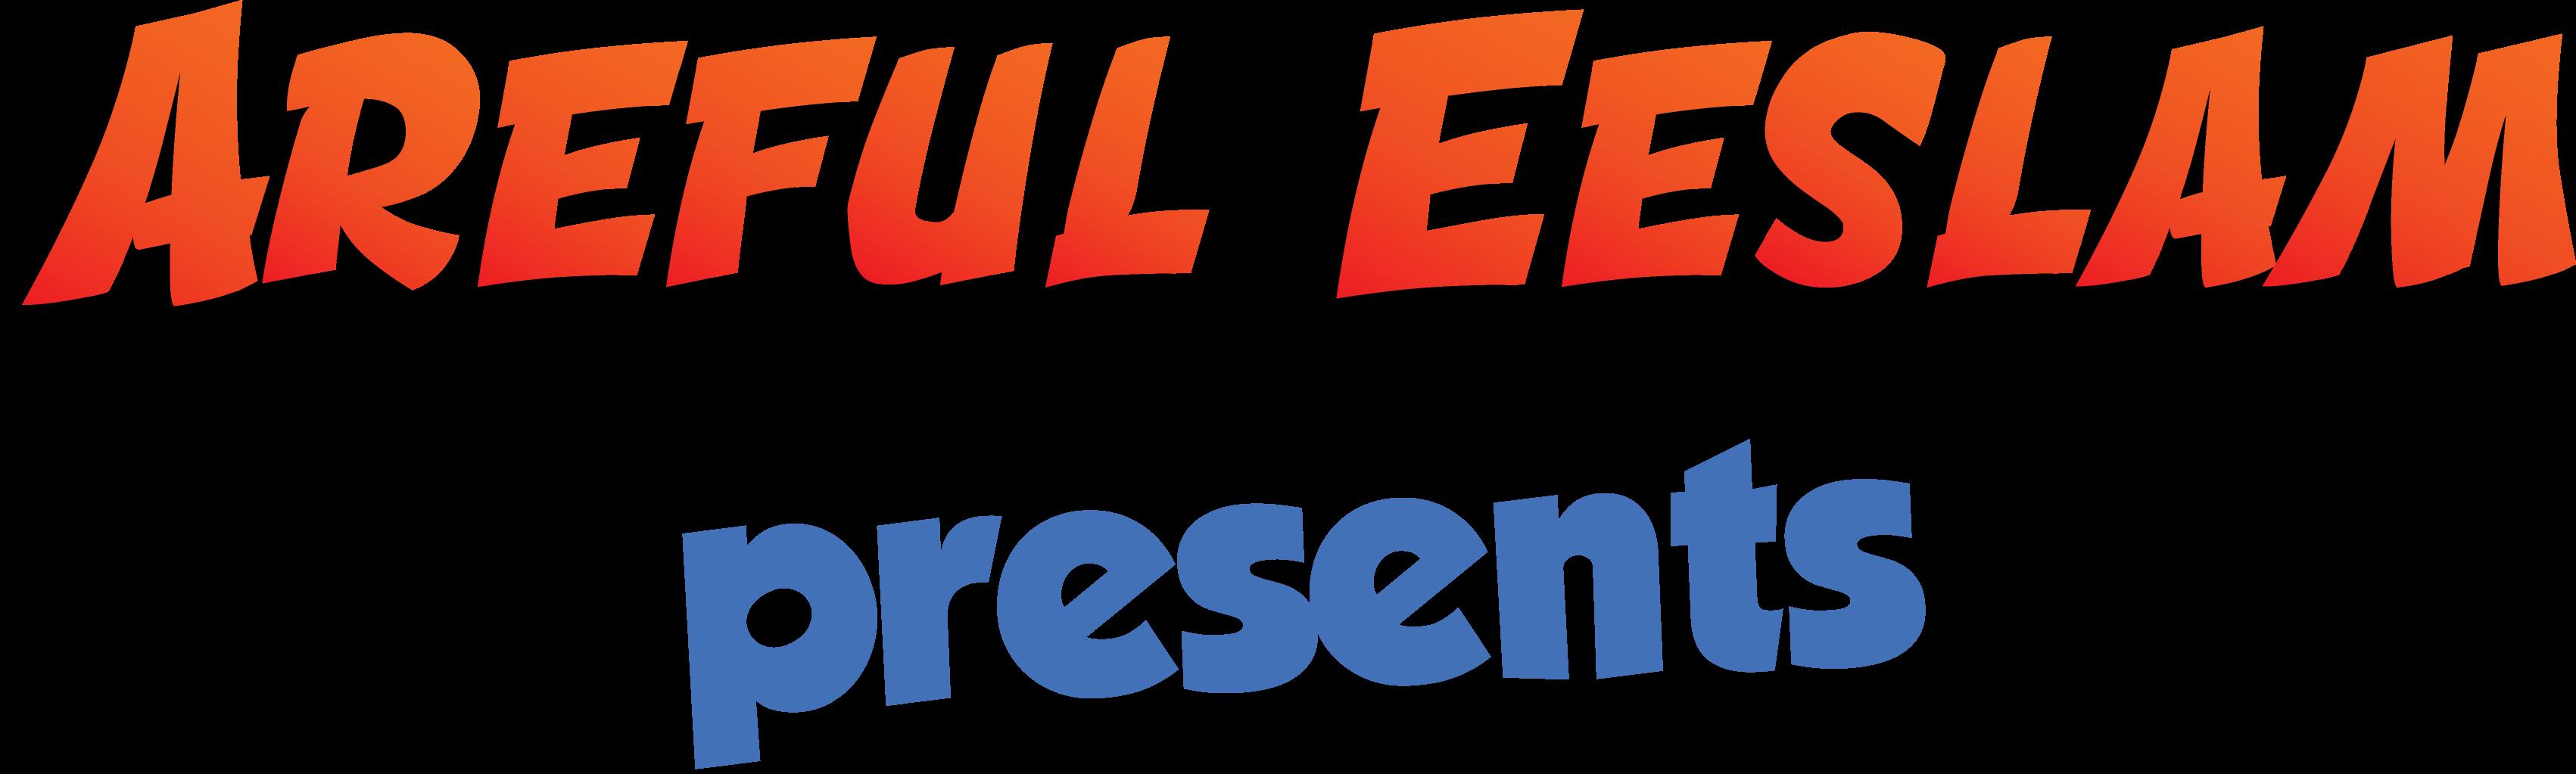 Areful Eeslam Presents - Consultation